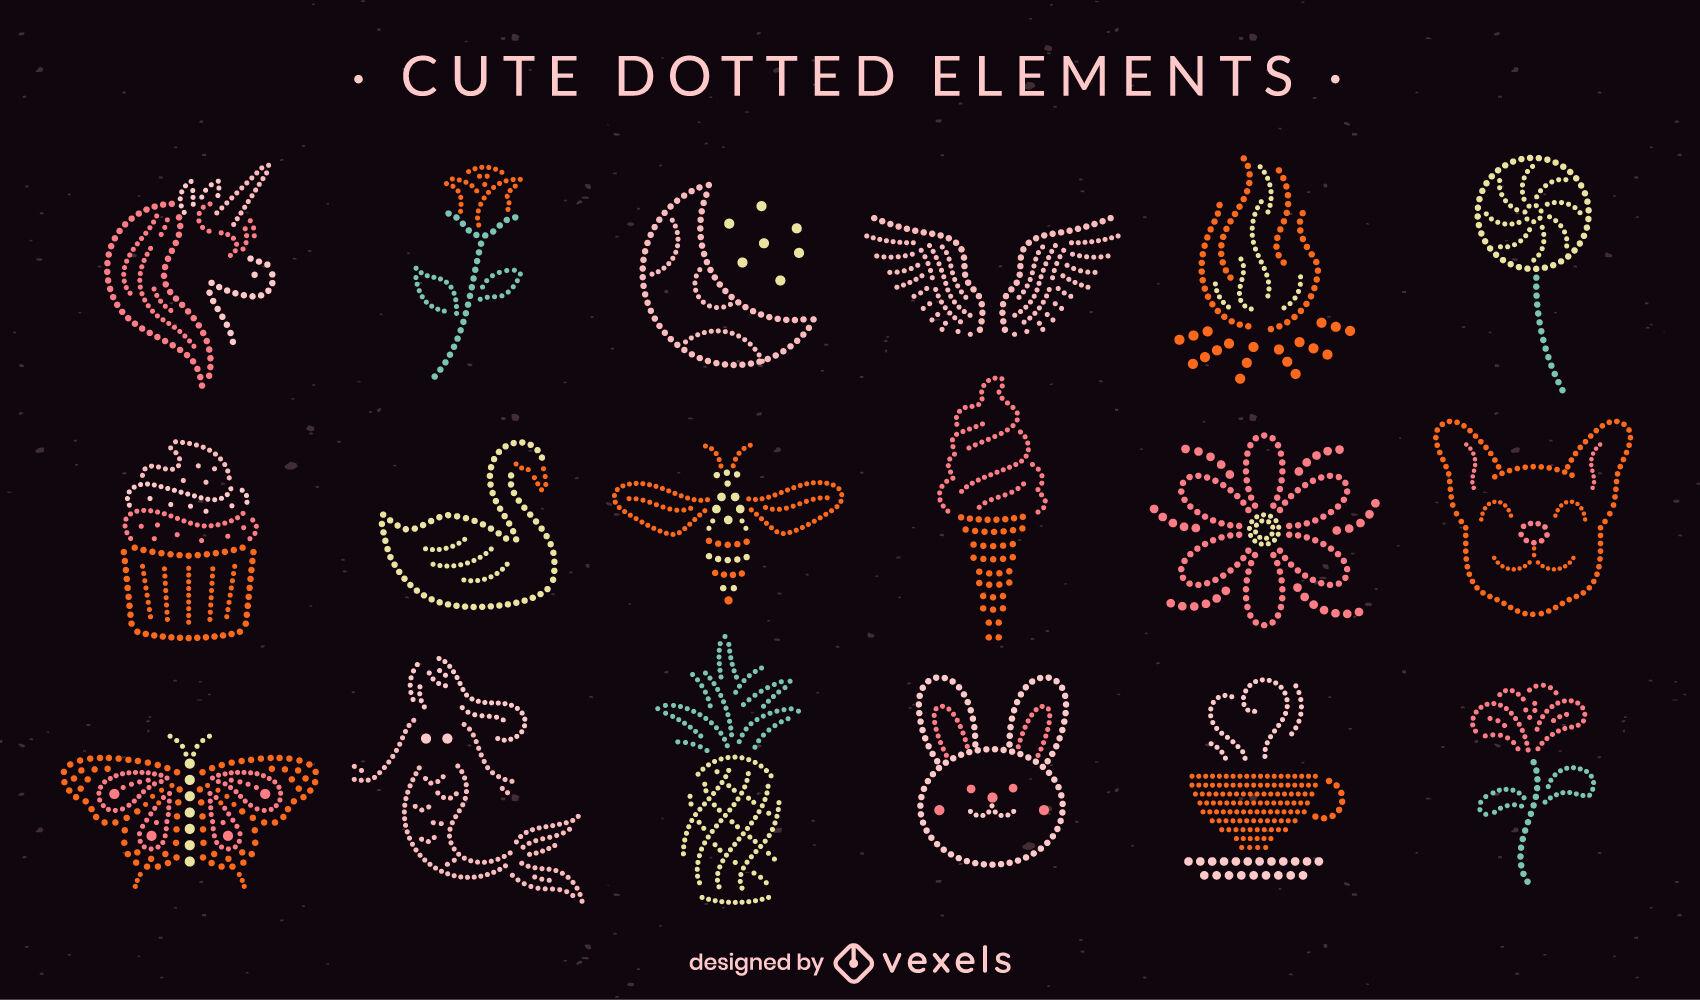 Elementos lindos punteados simples